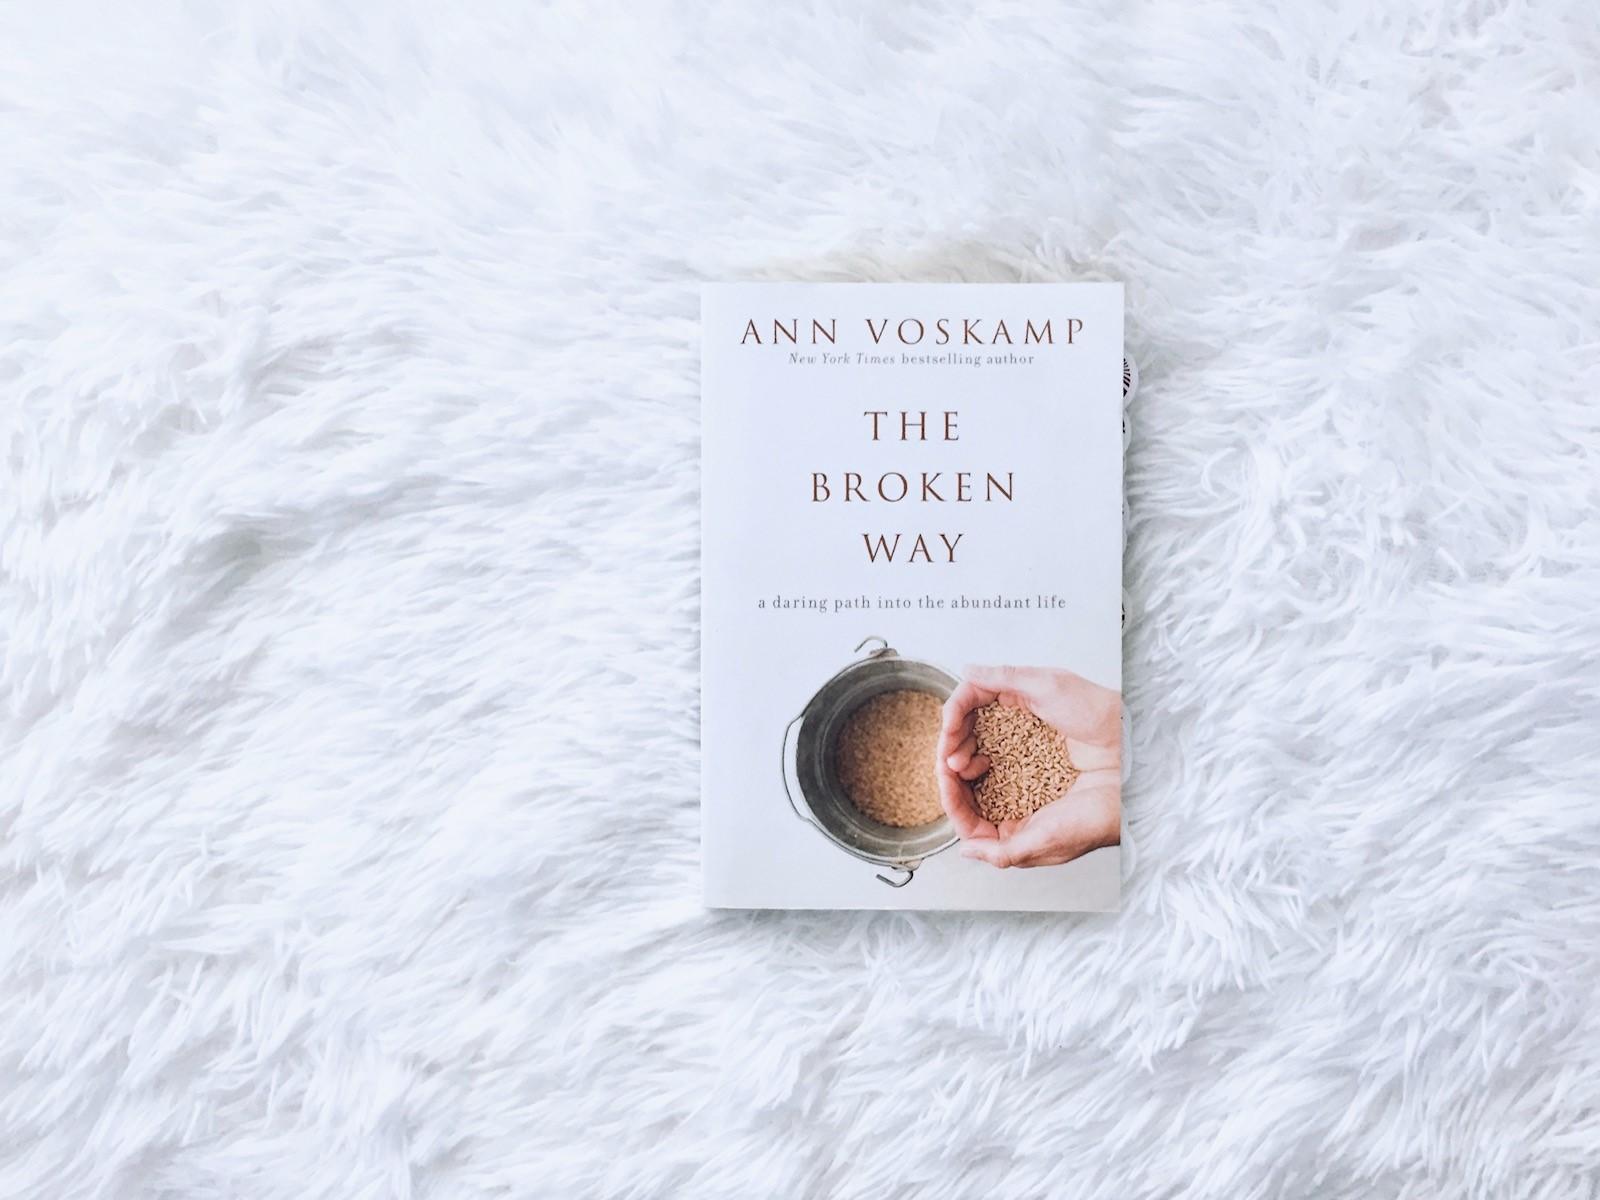 The Broken Way: A Daring Path Into Abundant Life by Ann Voskamp